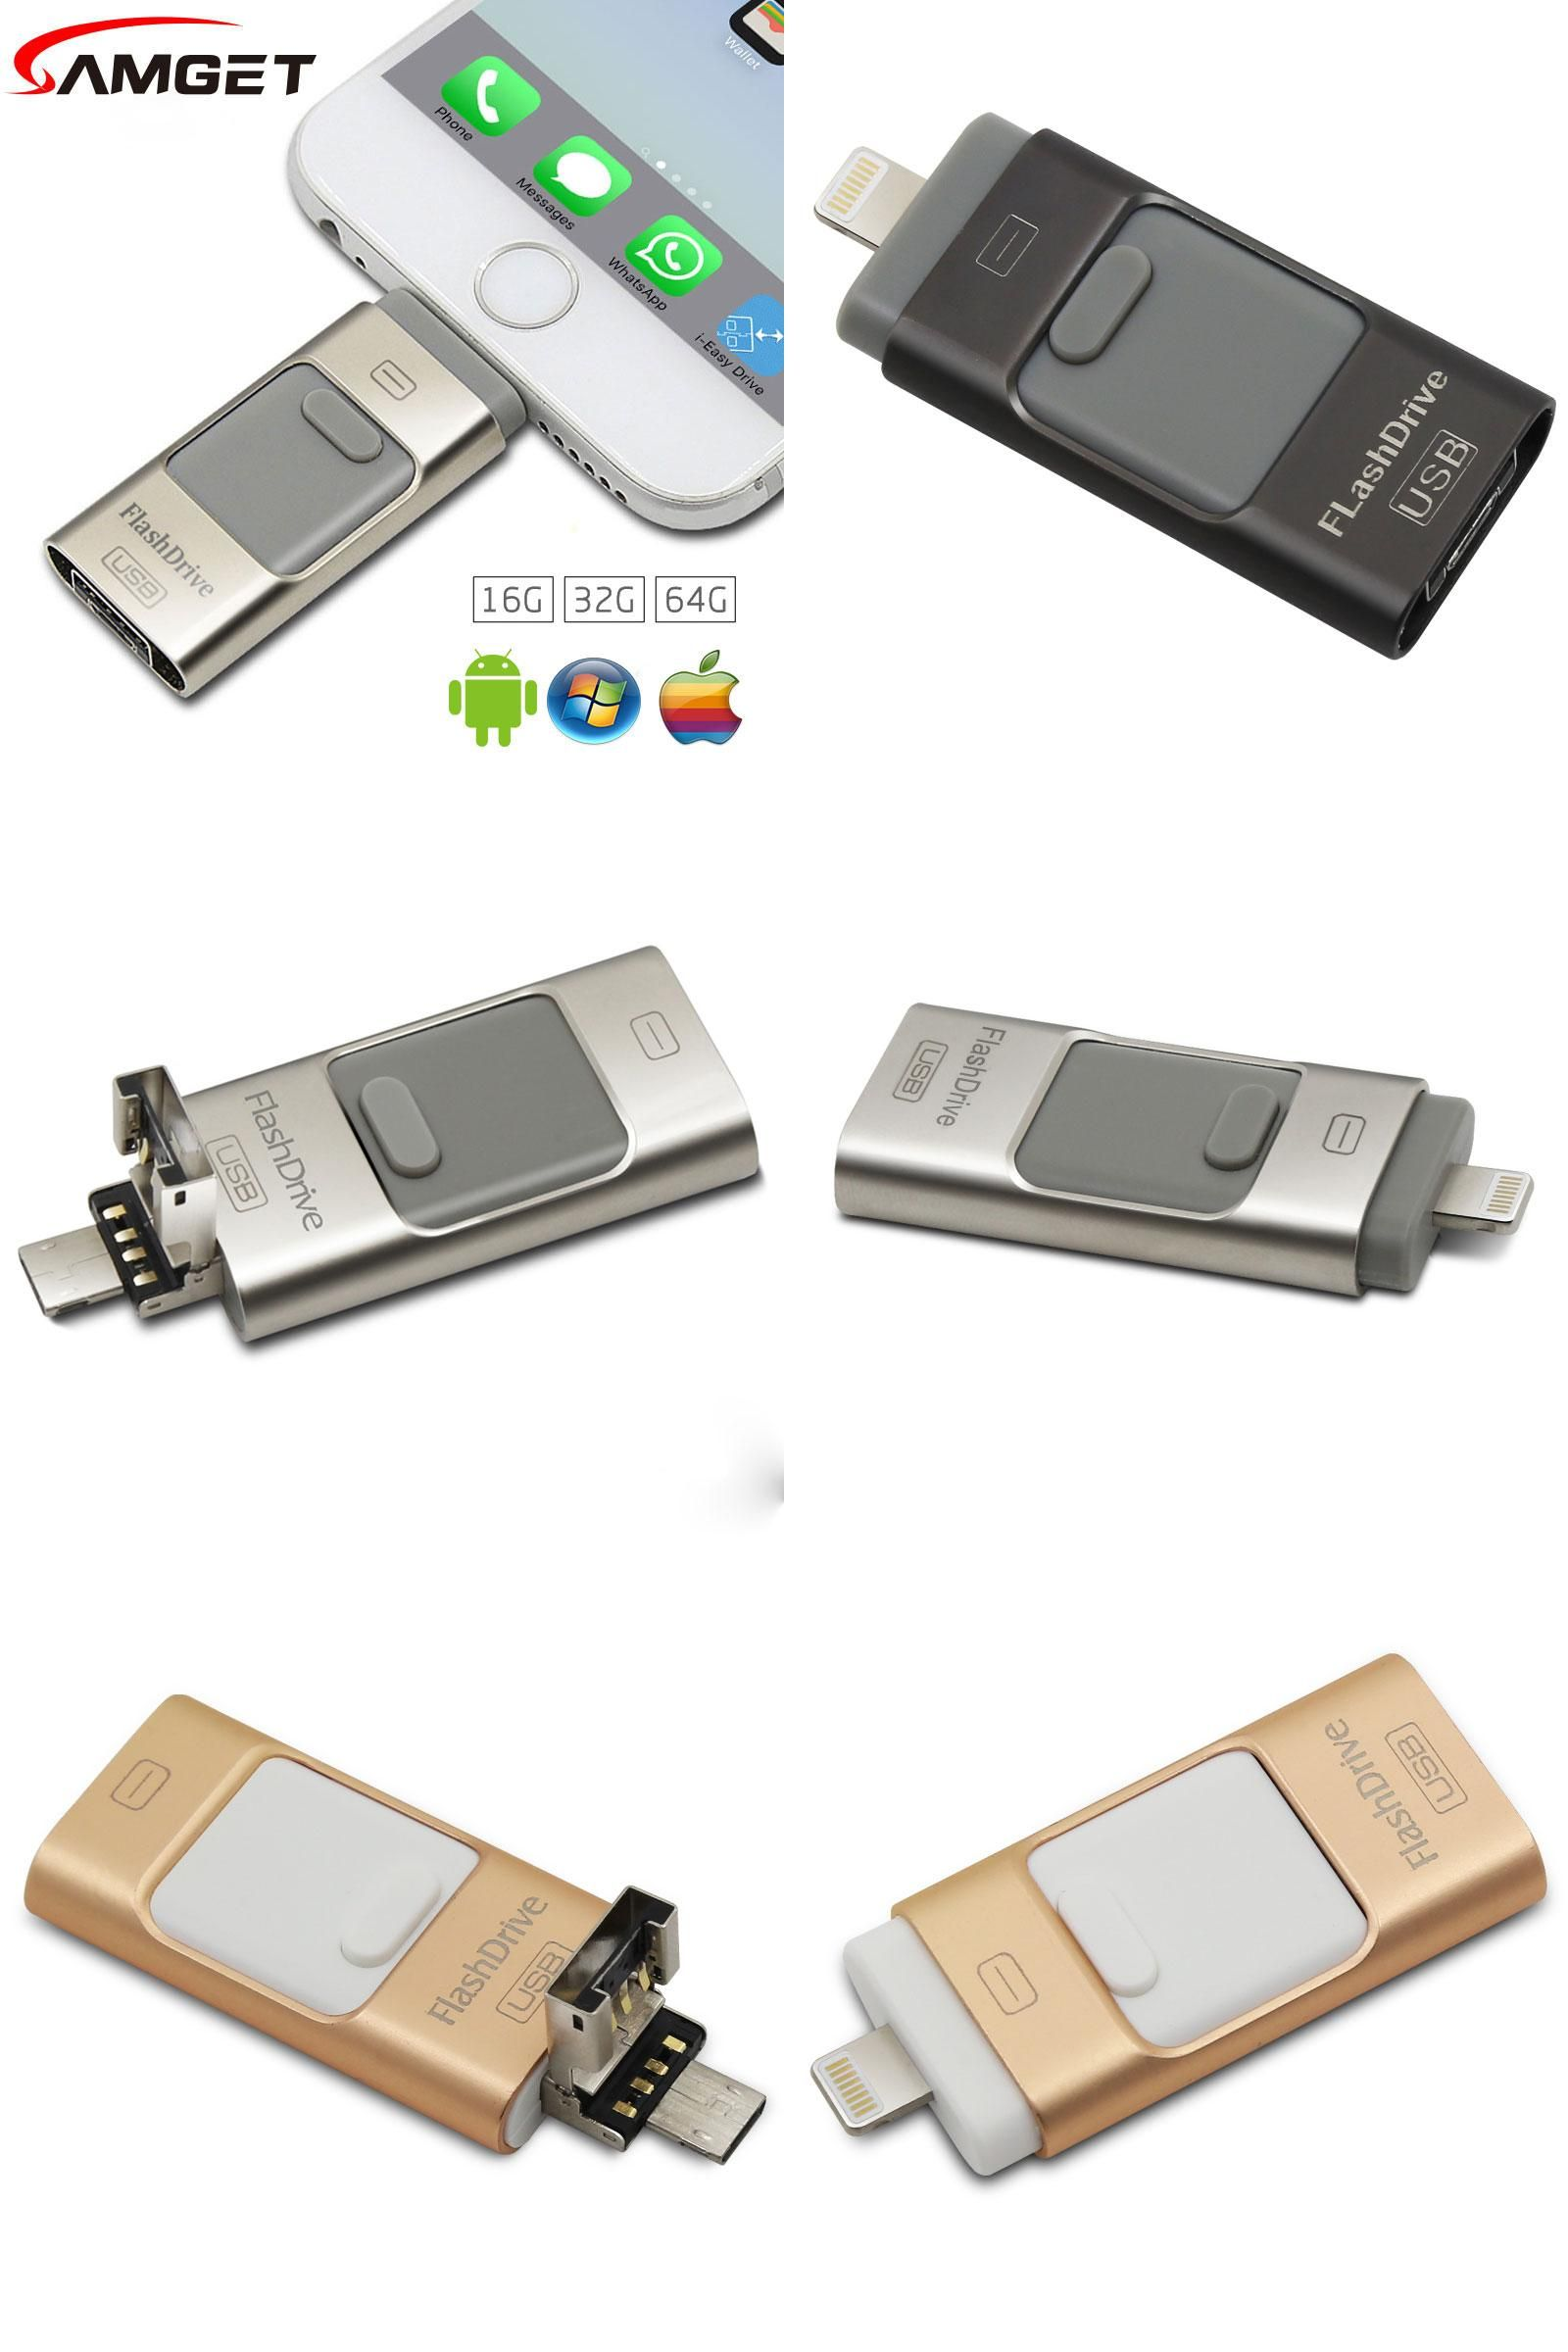 Visit To Buy Samget 3 In 1 Micro Usb 20 Metal Pen Drive Otg Flashdisk Samsung 64gb